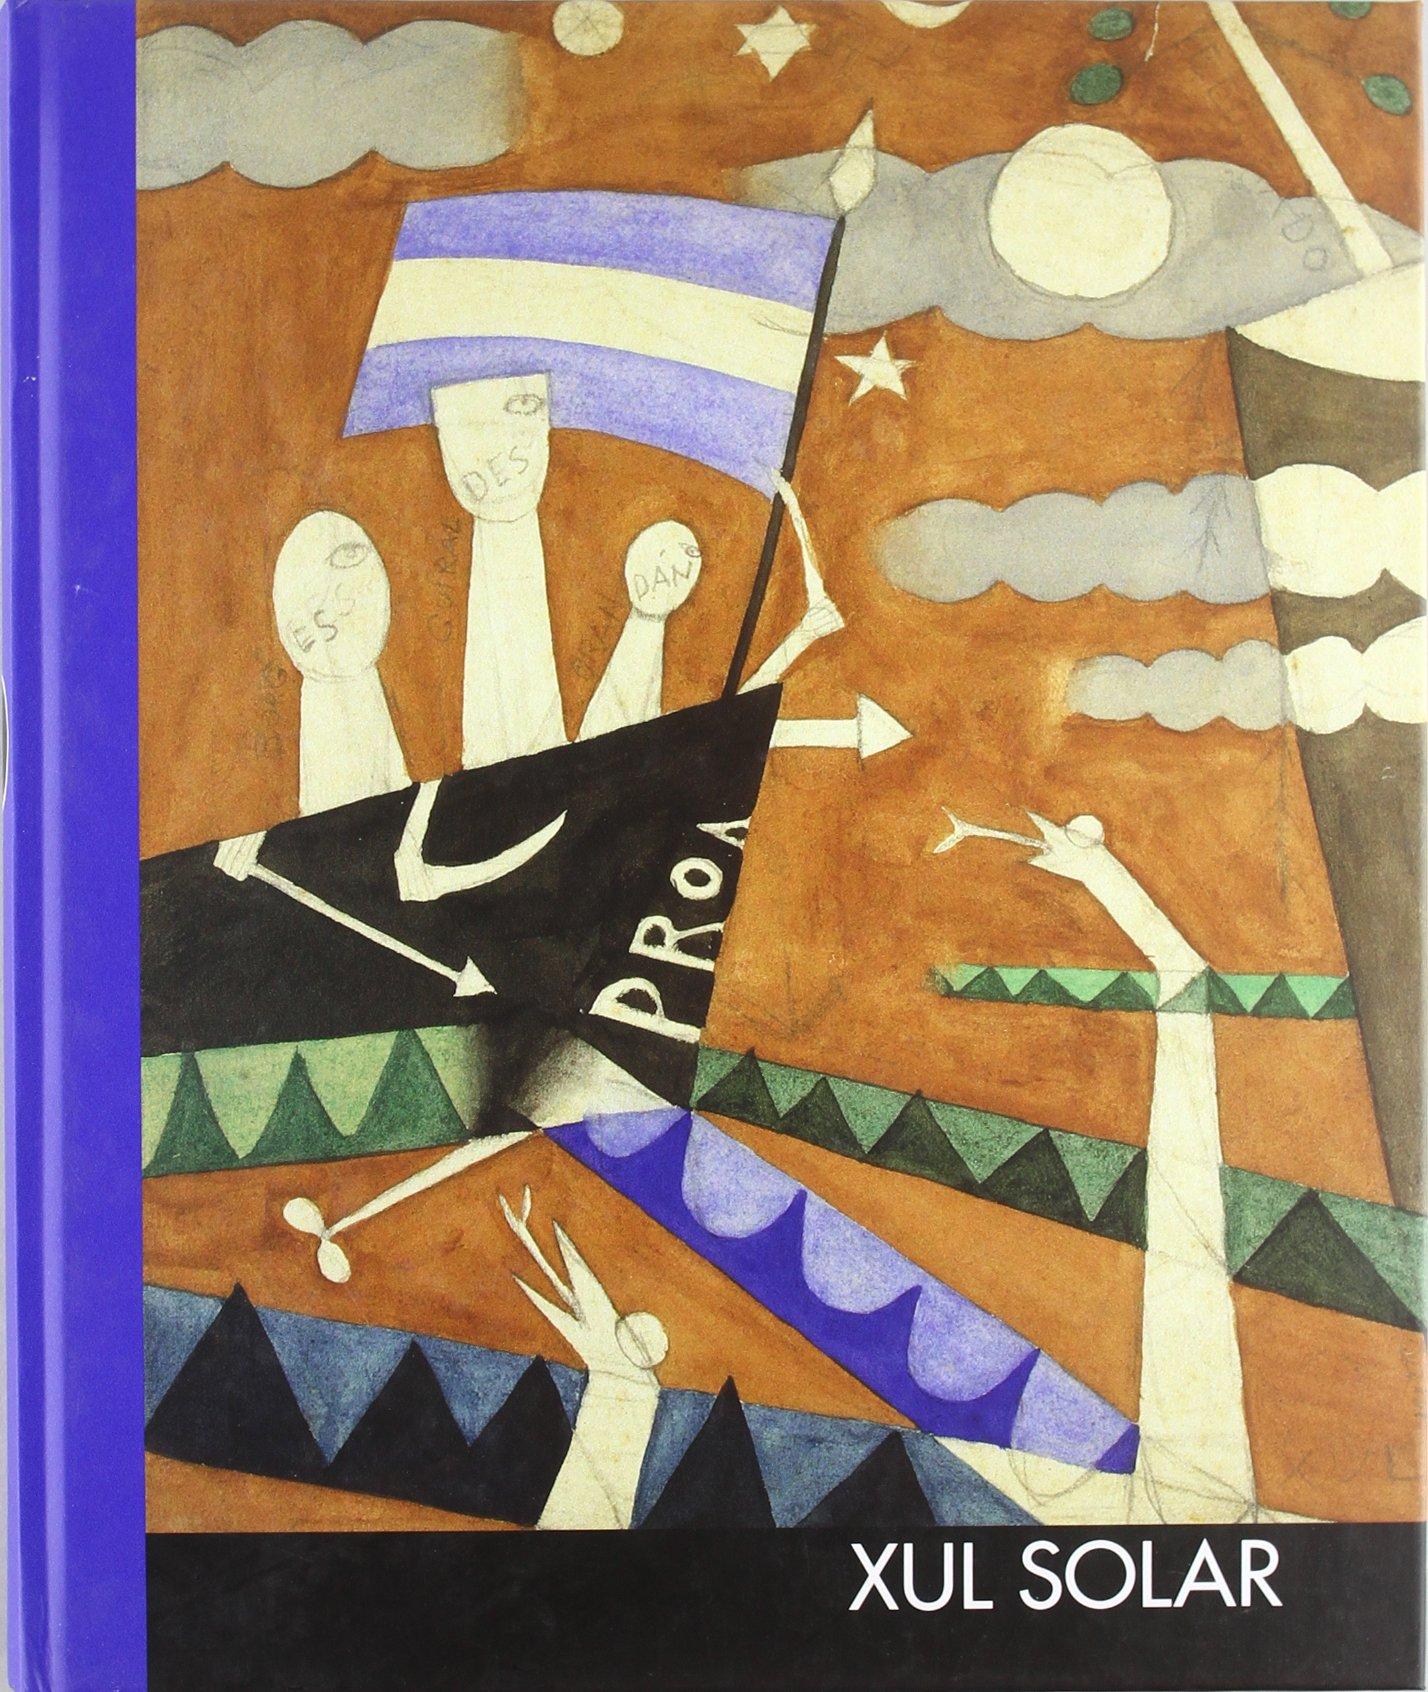 Xul Solar: Marcos-Ricardo Barnatán, Oswaldo Svanascini, Beatriz Sarlo,  Belén Gache, And Sergio Baur; Introduction... Jorge Luis Borges:  9788480261586: ...